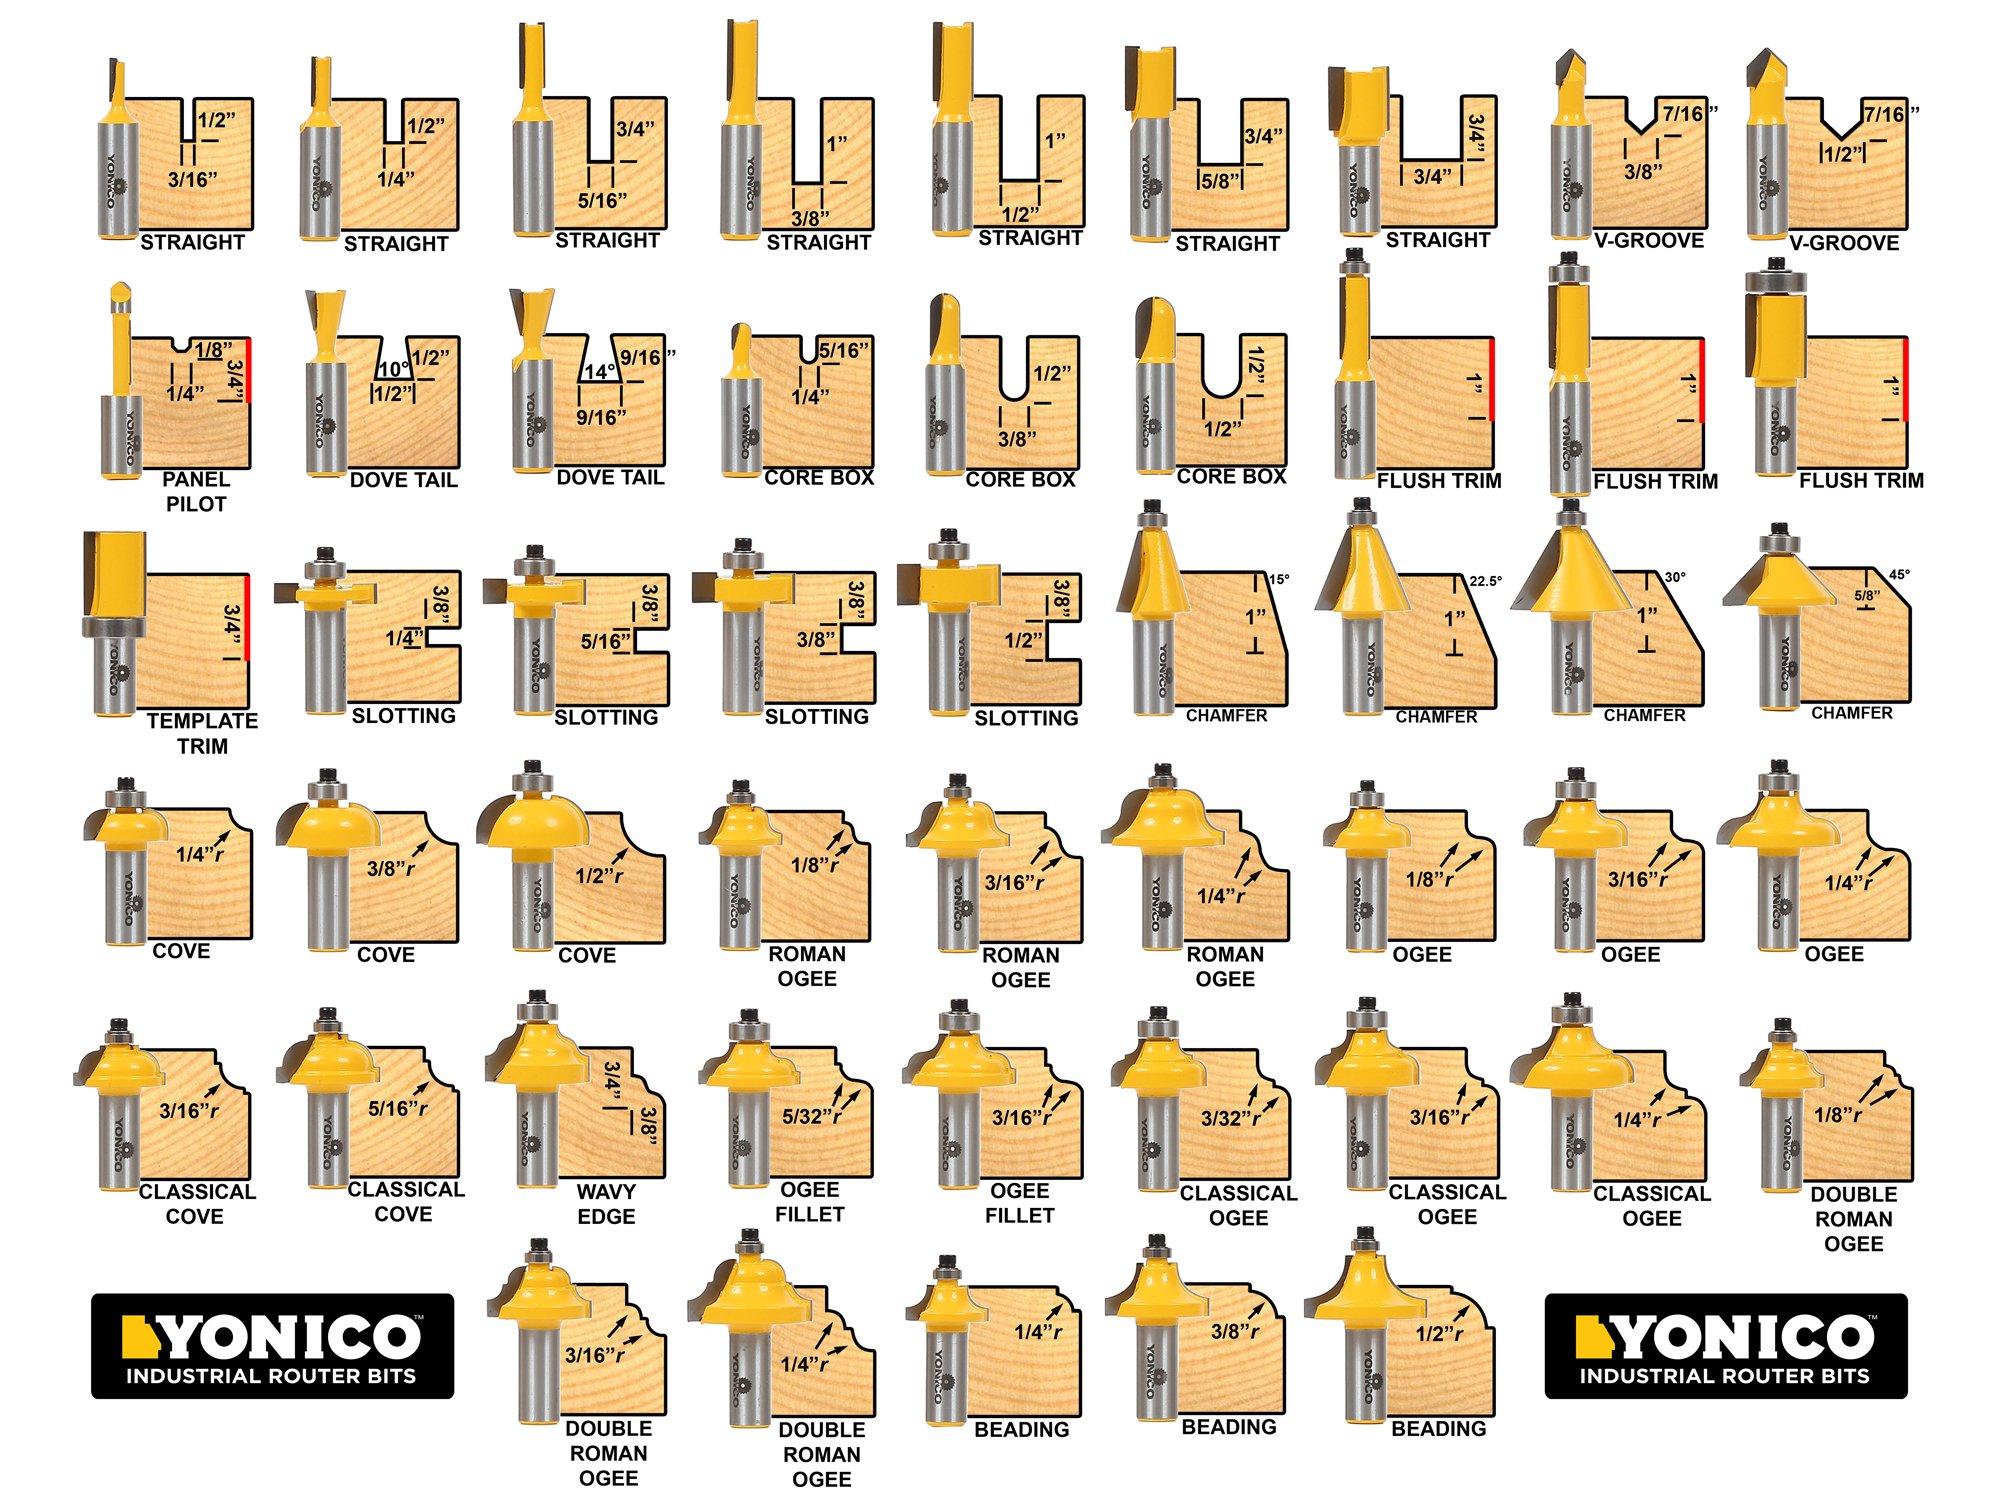 Yonico 17504 50 Bits Professional Quality Router Bit Set C3 Carbide 1/4-Inch Shank